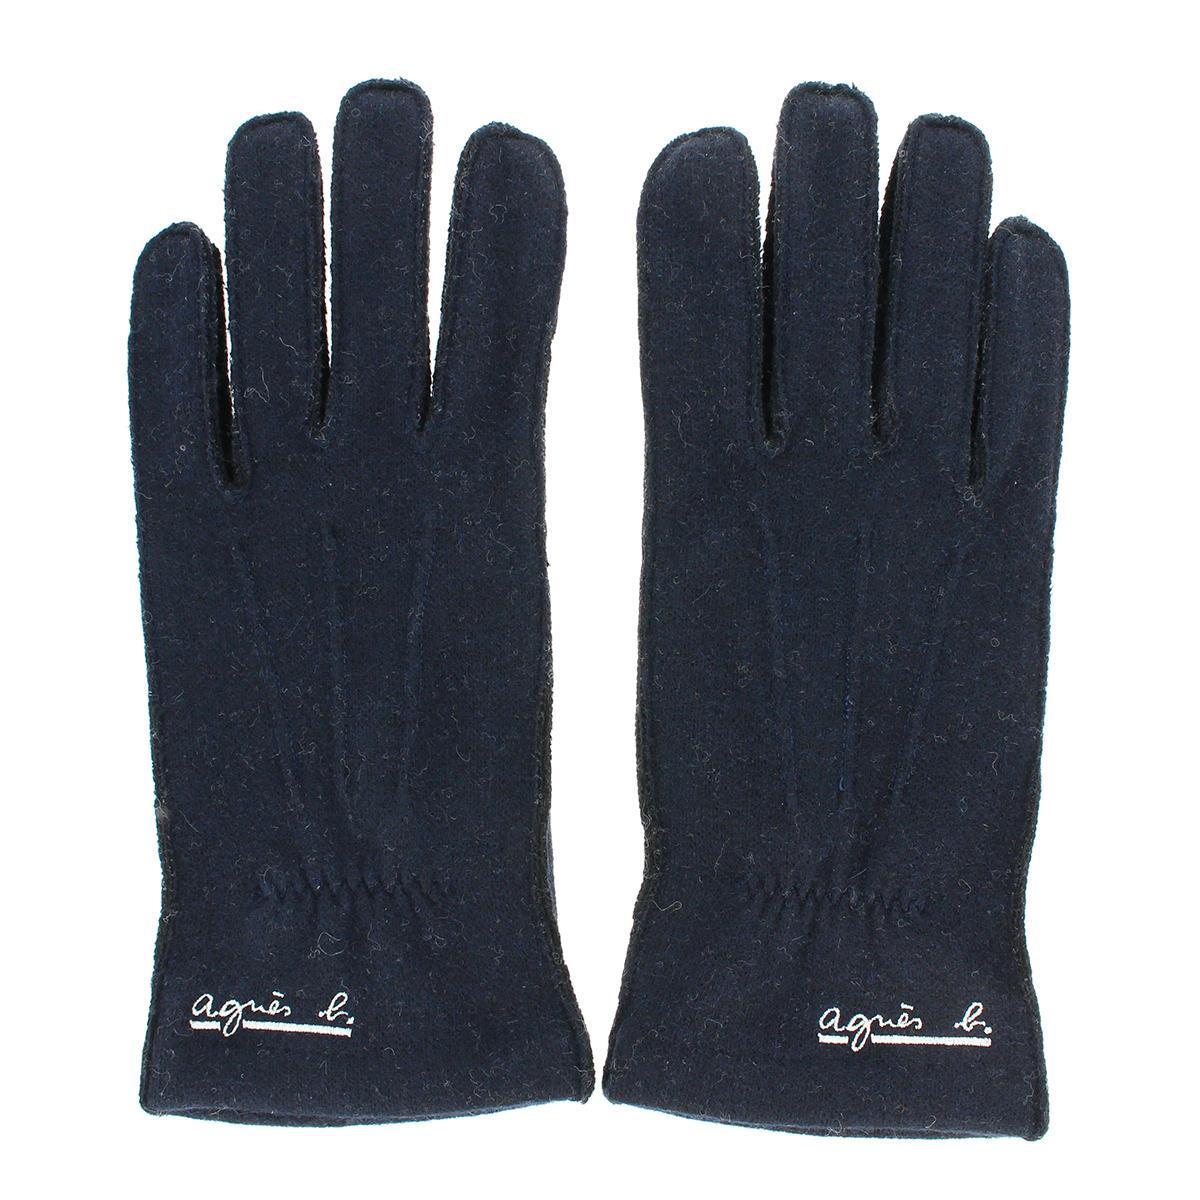 【SALE】メンズ手袋 ジャージ プレゼント 人気ブランド アニエスベーオム 男性用 防寒 保温 シンプル スマホ対応 タッチパネル対応 ギフトに最適